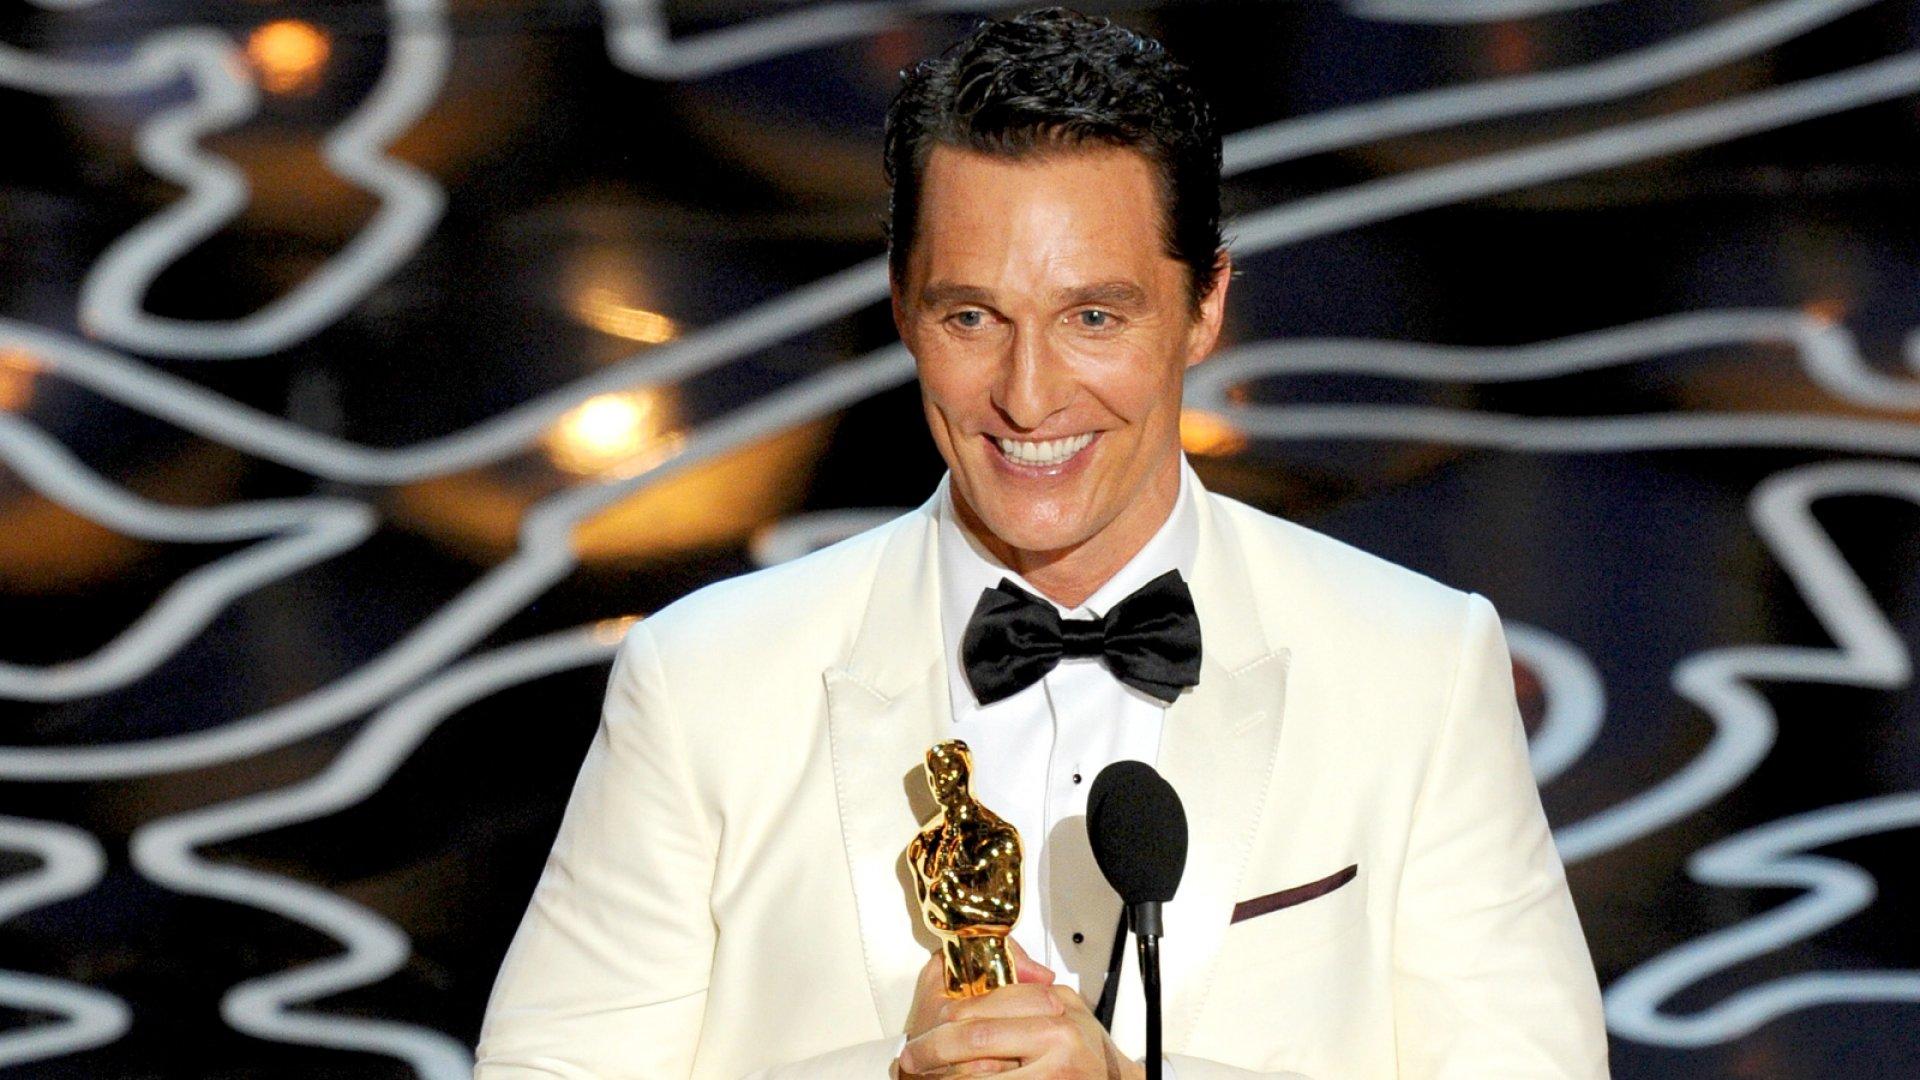 Leadership Lessons From Matthew McConaughey's Oscars Speech